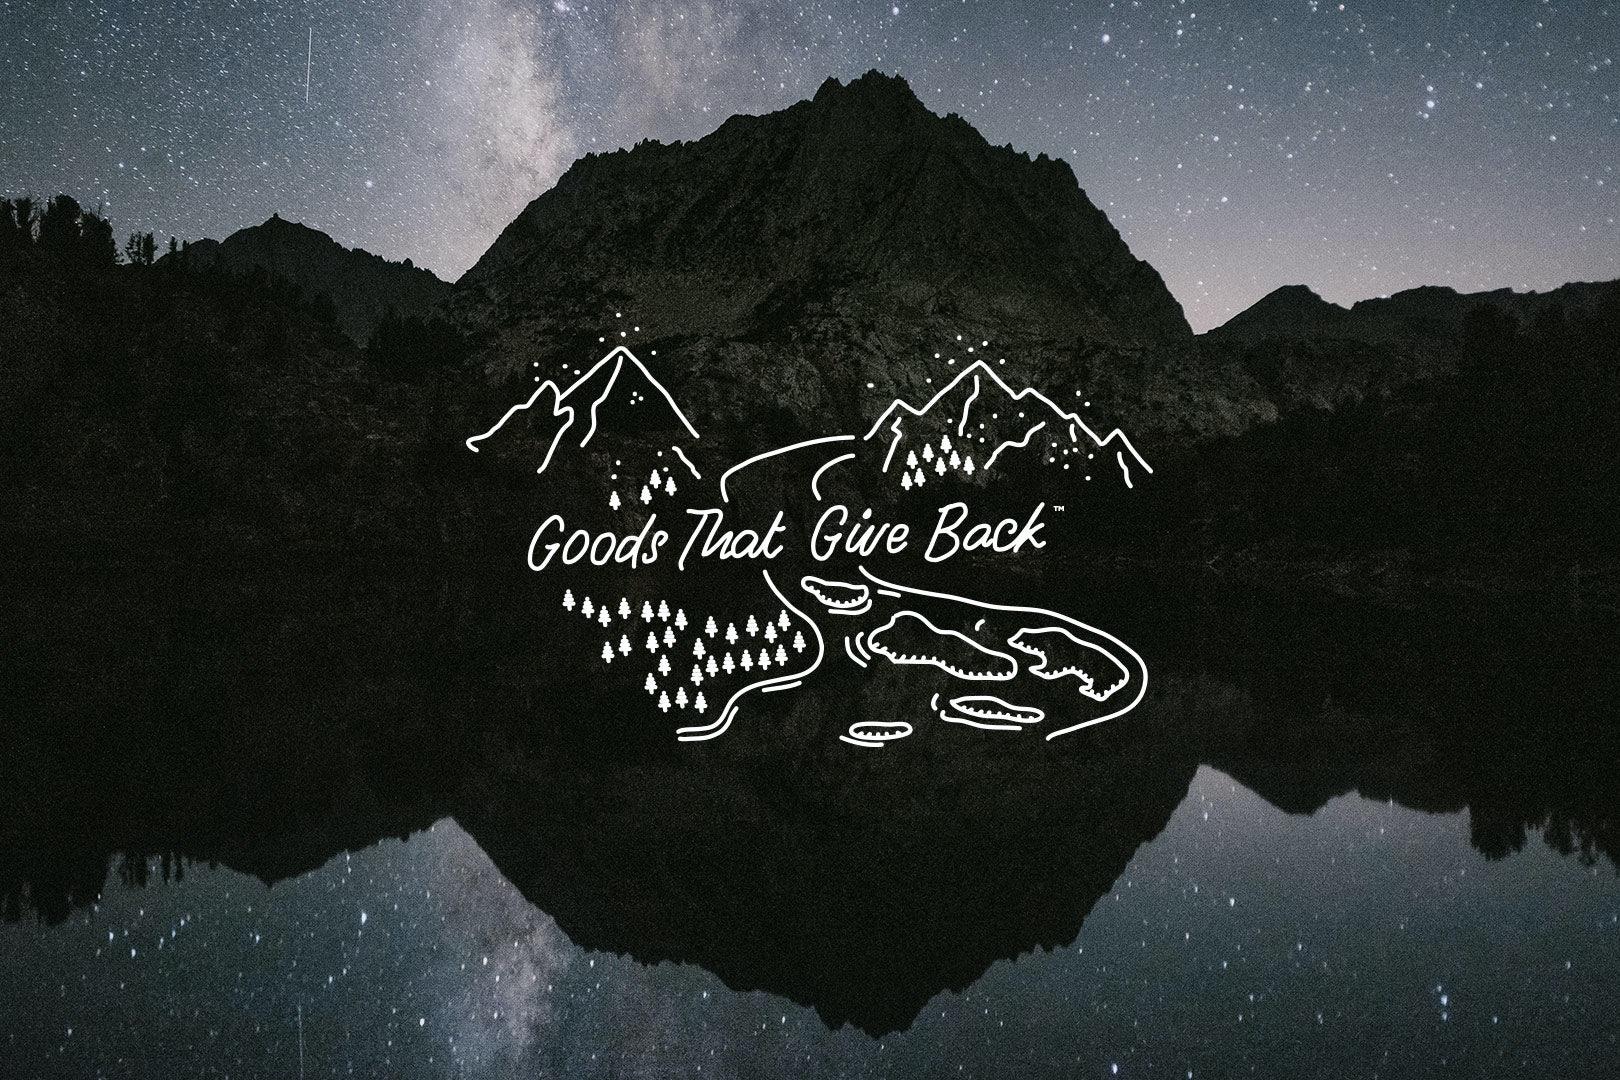 Tillak - Goods That Give Back™